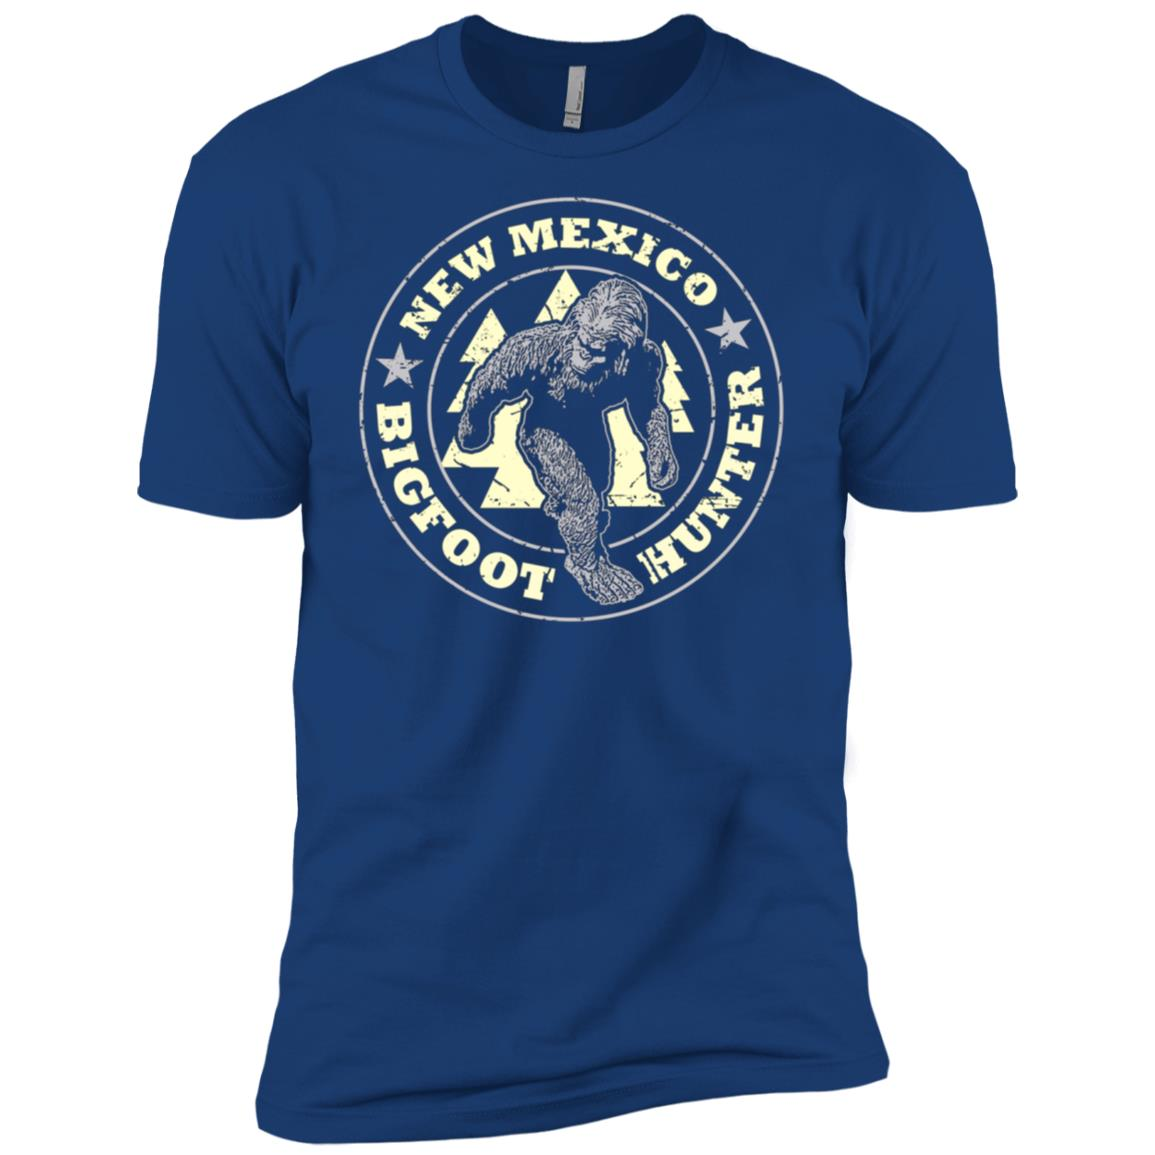 New Mexico Bigfoot Hunter Believe Men Short Sleeve T-Shirt